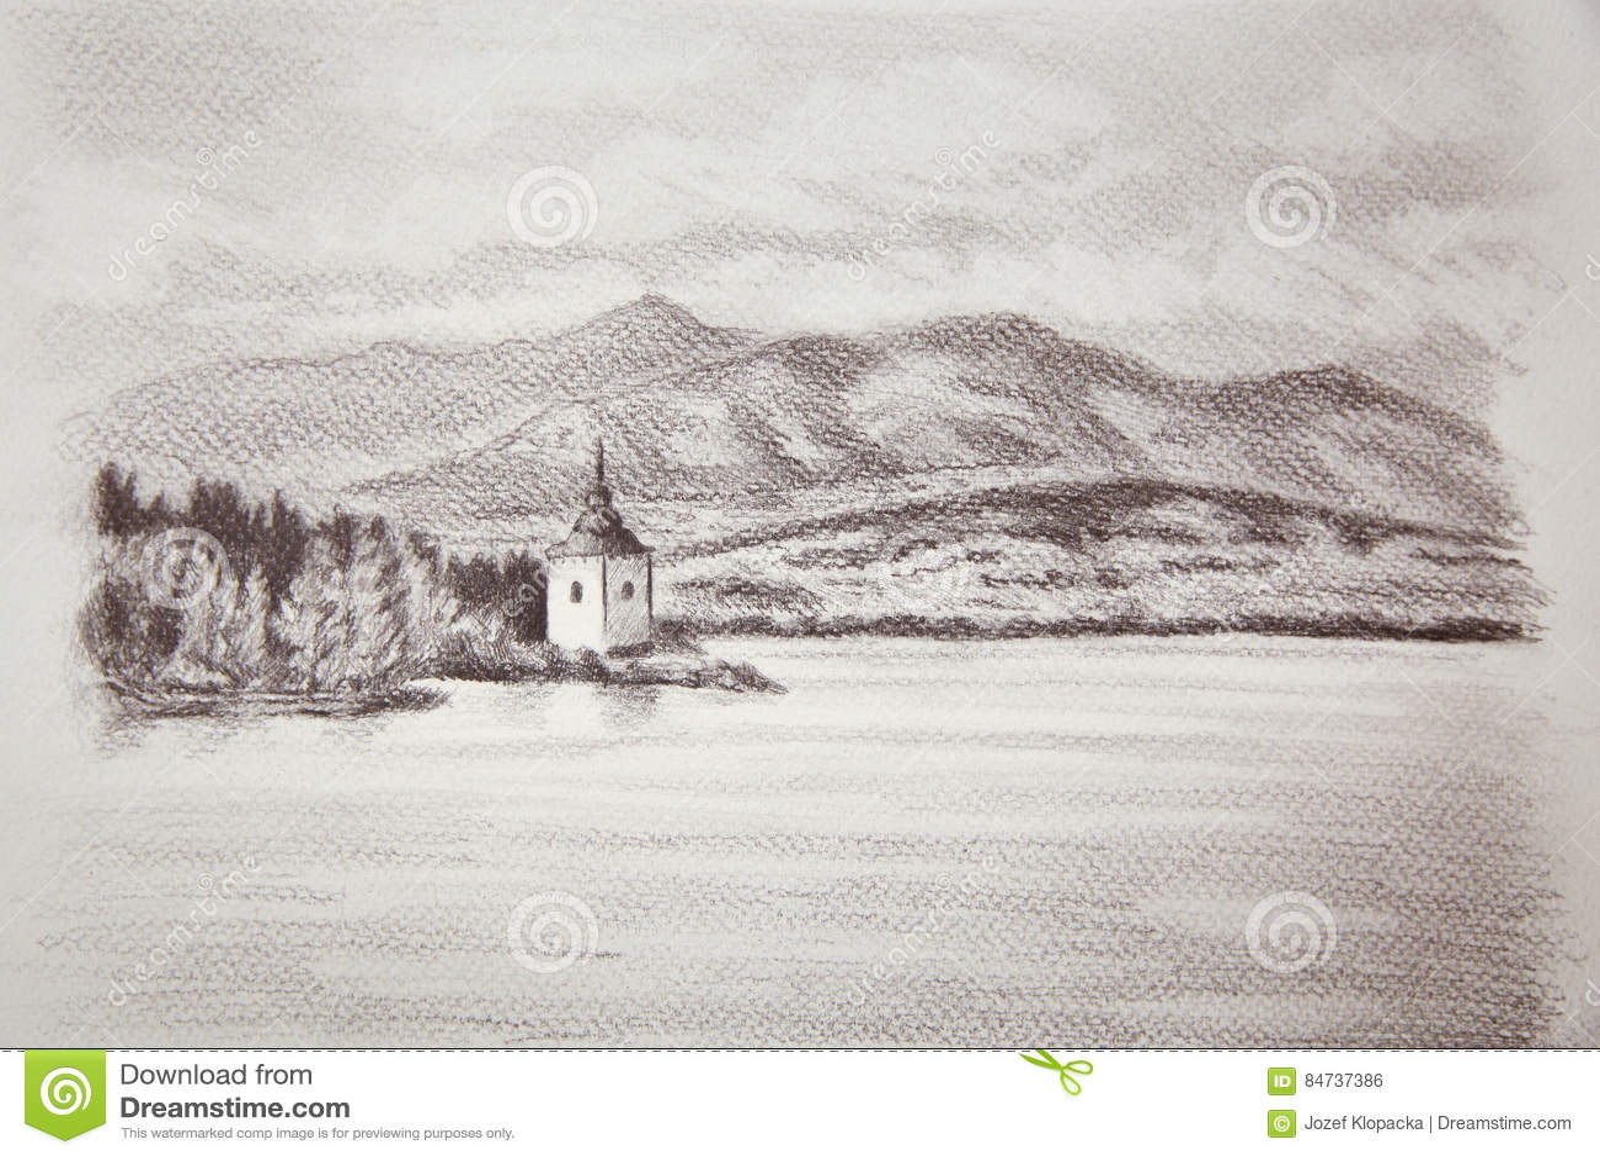 Fabelhaft Landcsape-Landschaft Mit See, Kapelle Und Bergen, Bleistift #FO_36